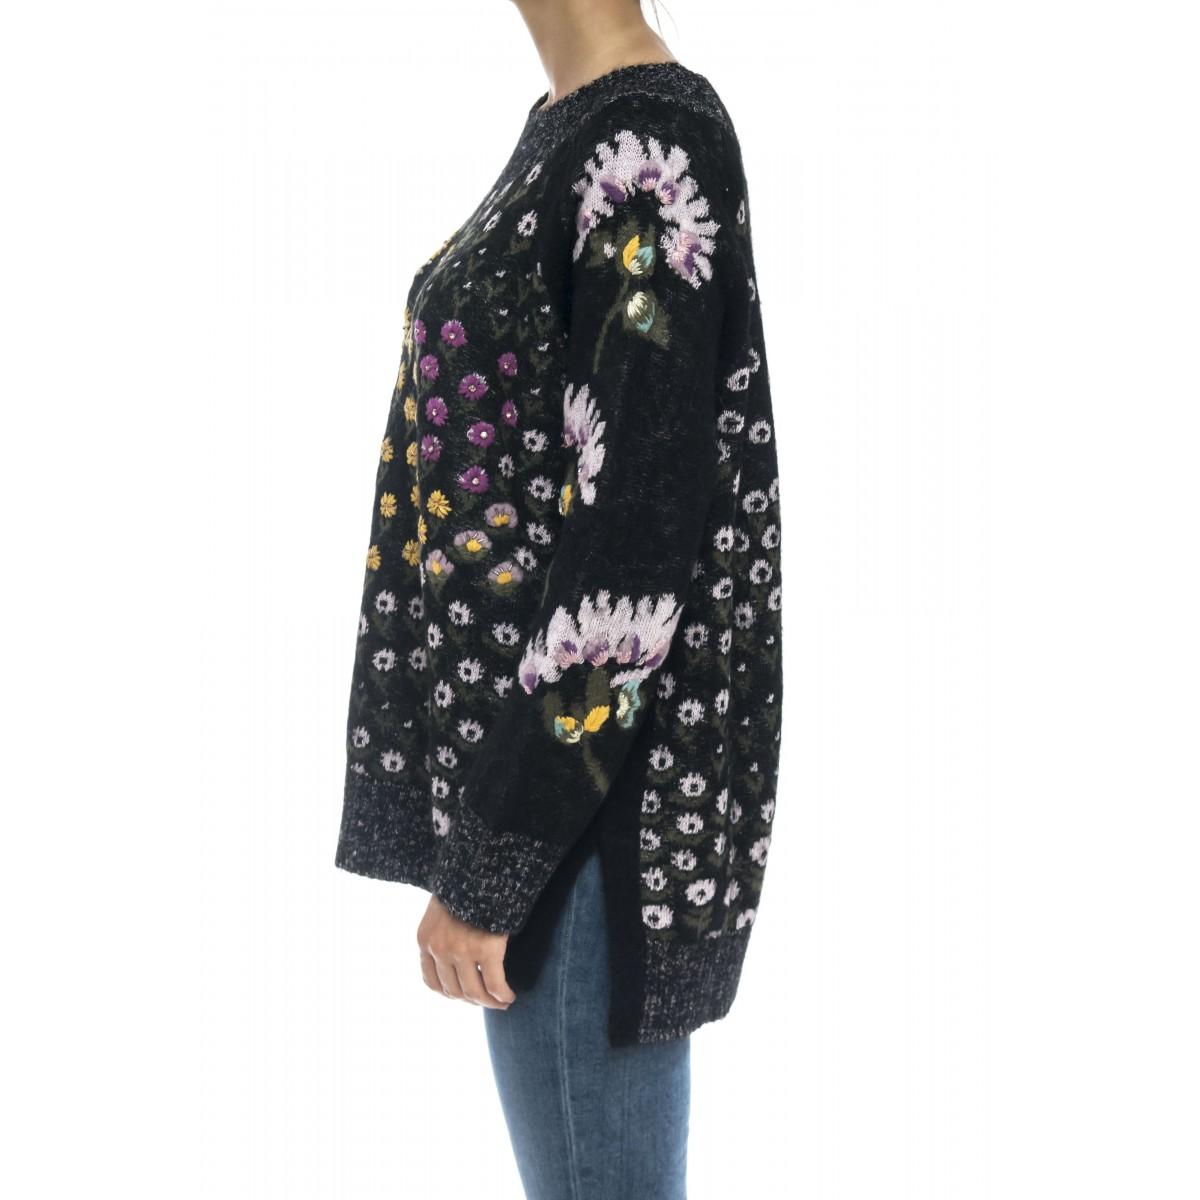 Maglieria - Tt3240 maglia ricamata swaroski misto moer